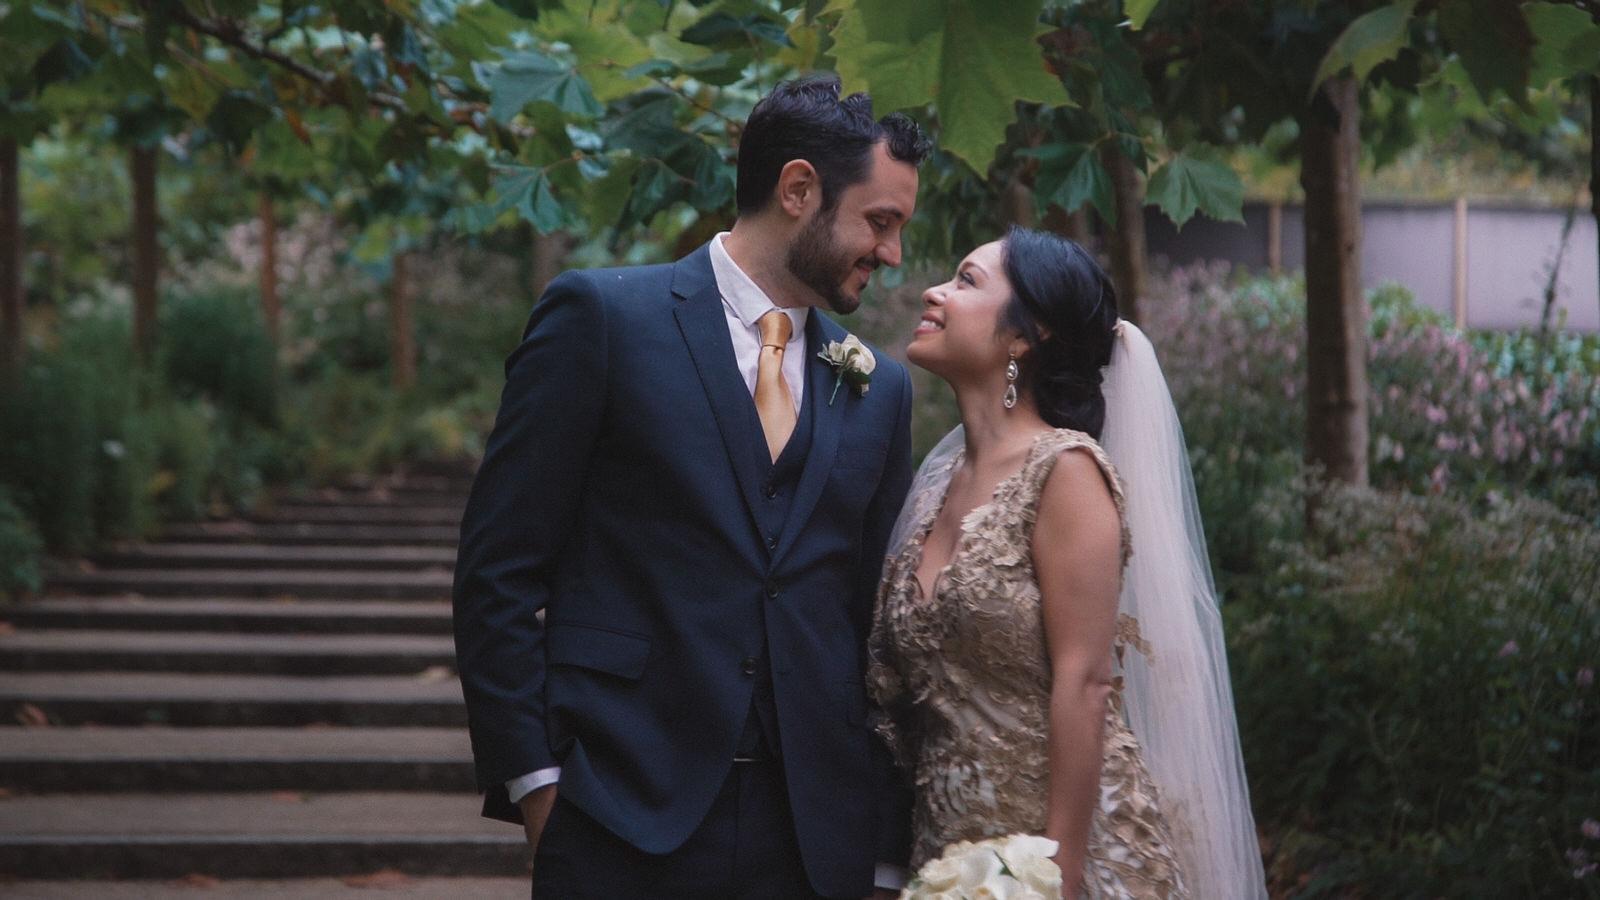 Eden Project, Cornwall - Wedding Videographer